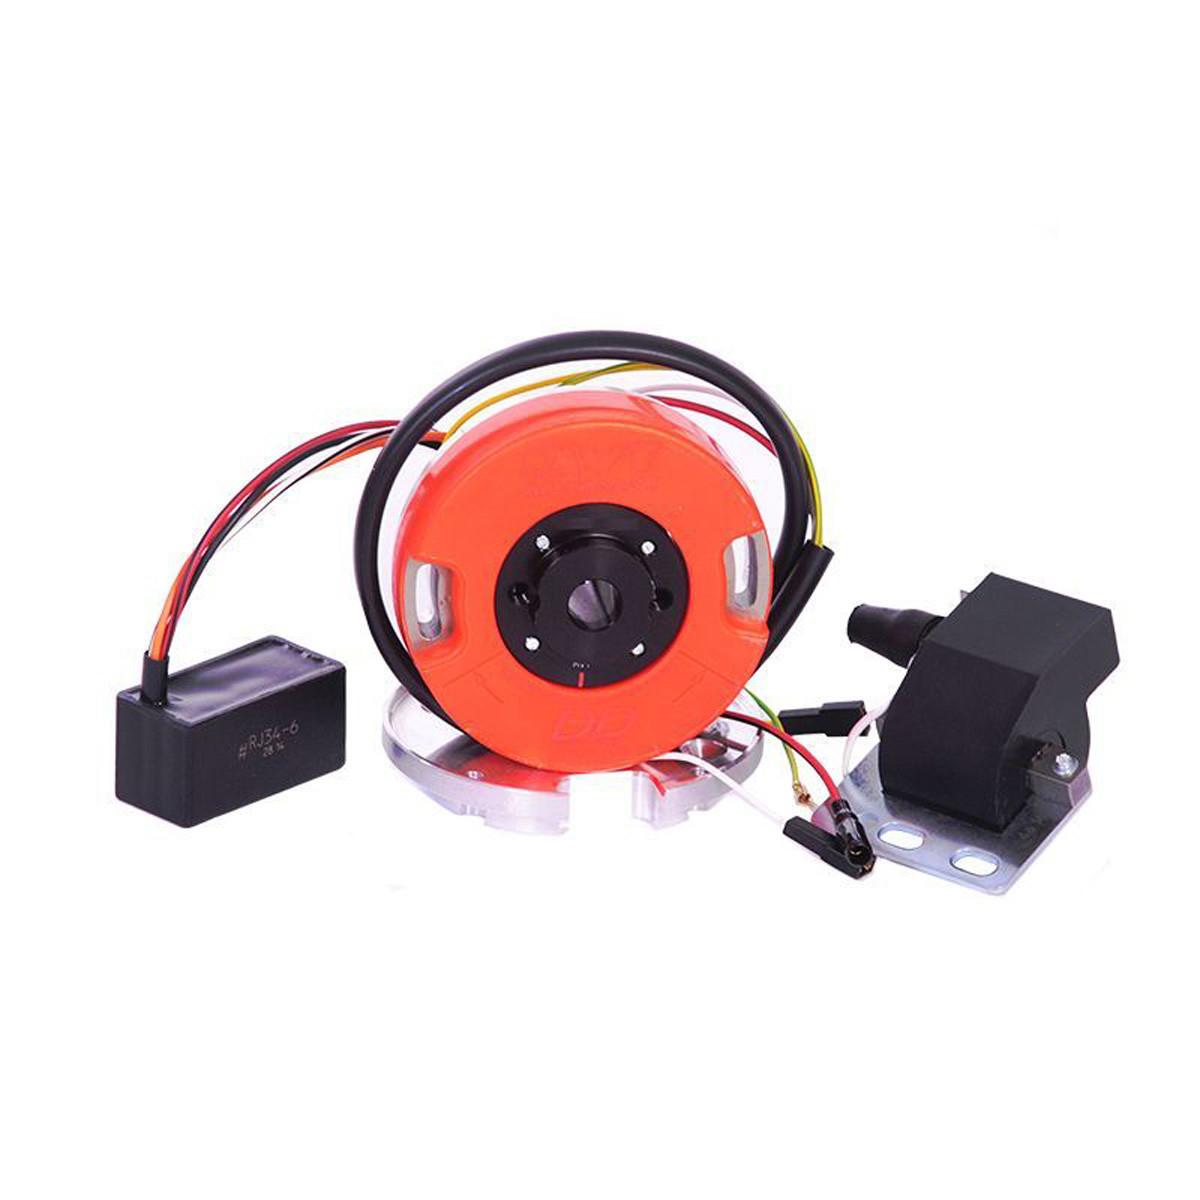 Allumage MBK - MVT Digital Direct DD 01 - Rotor interne - Avec Lumière